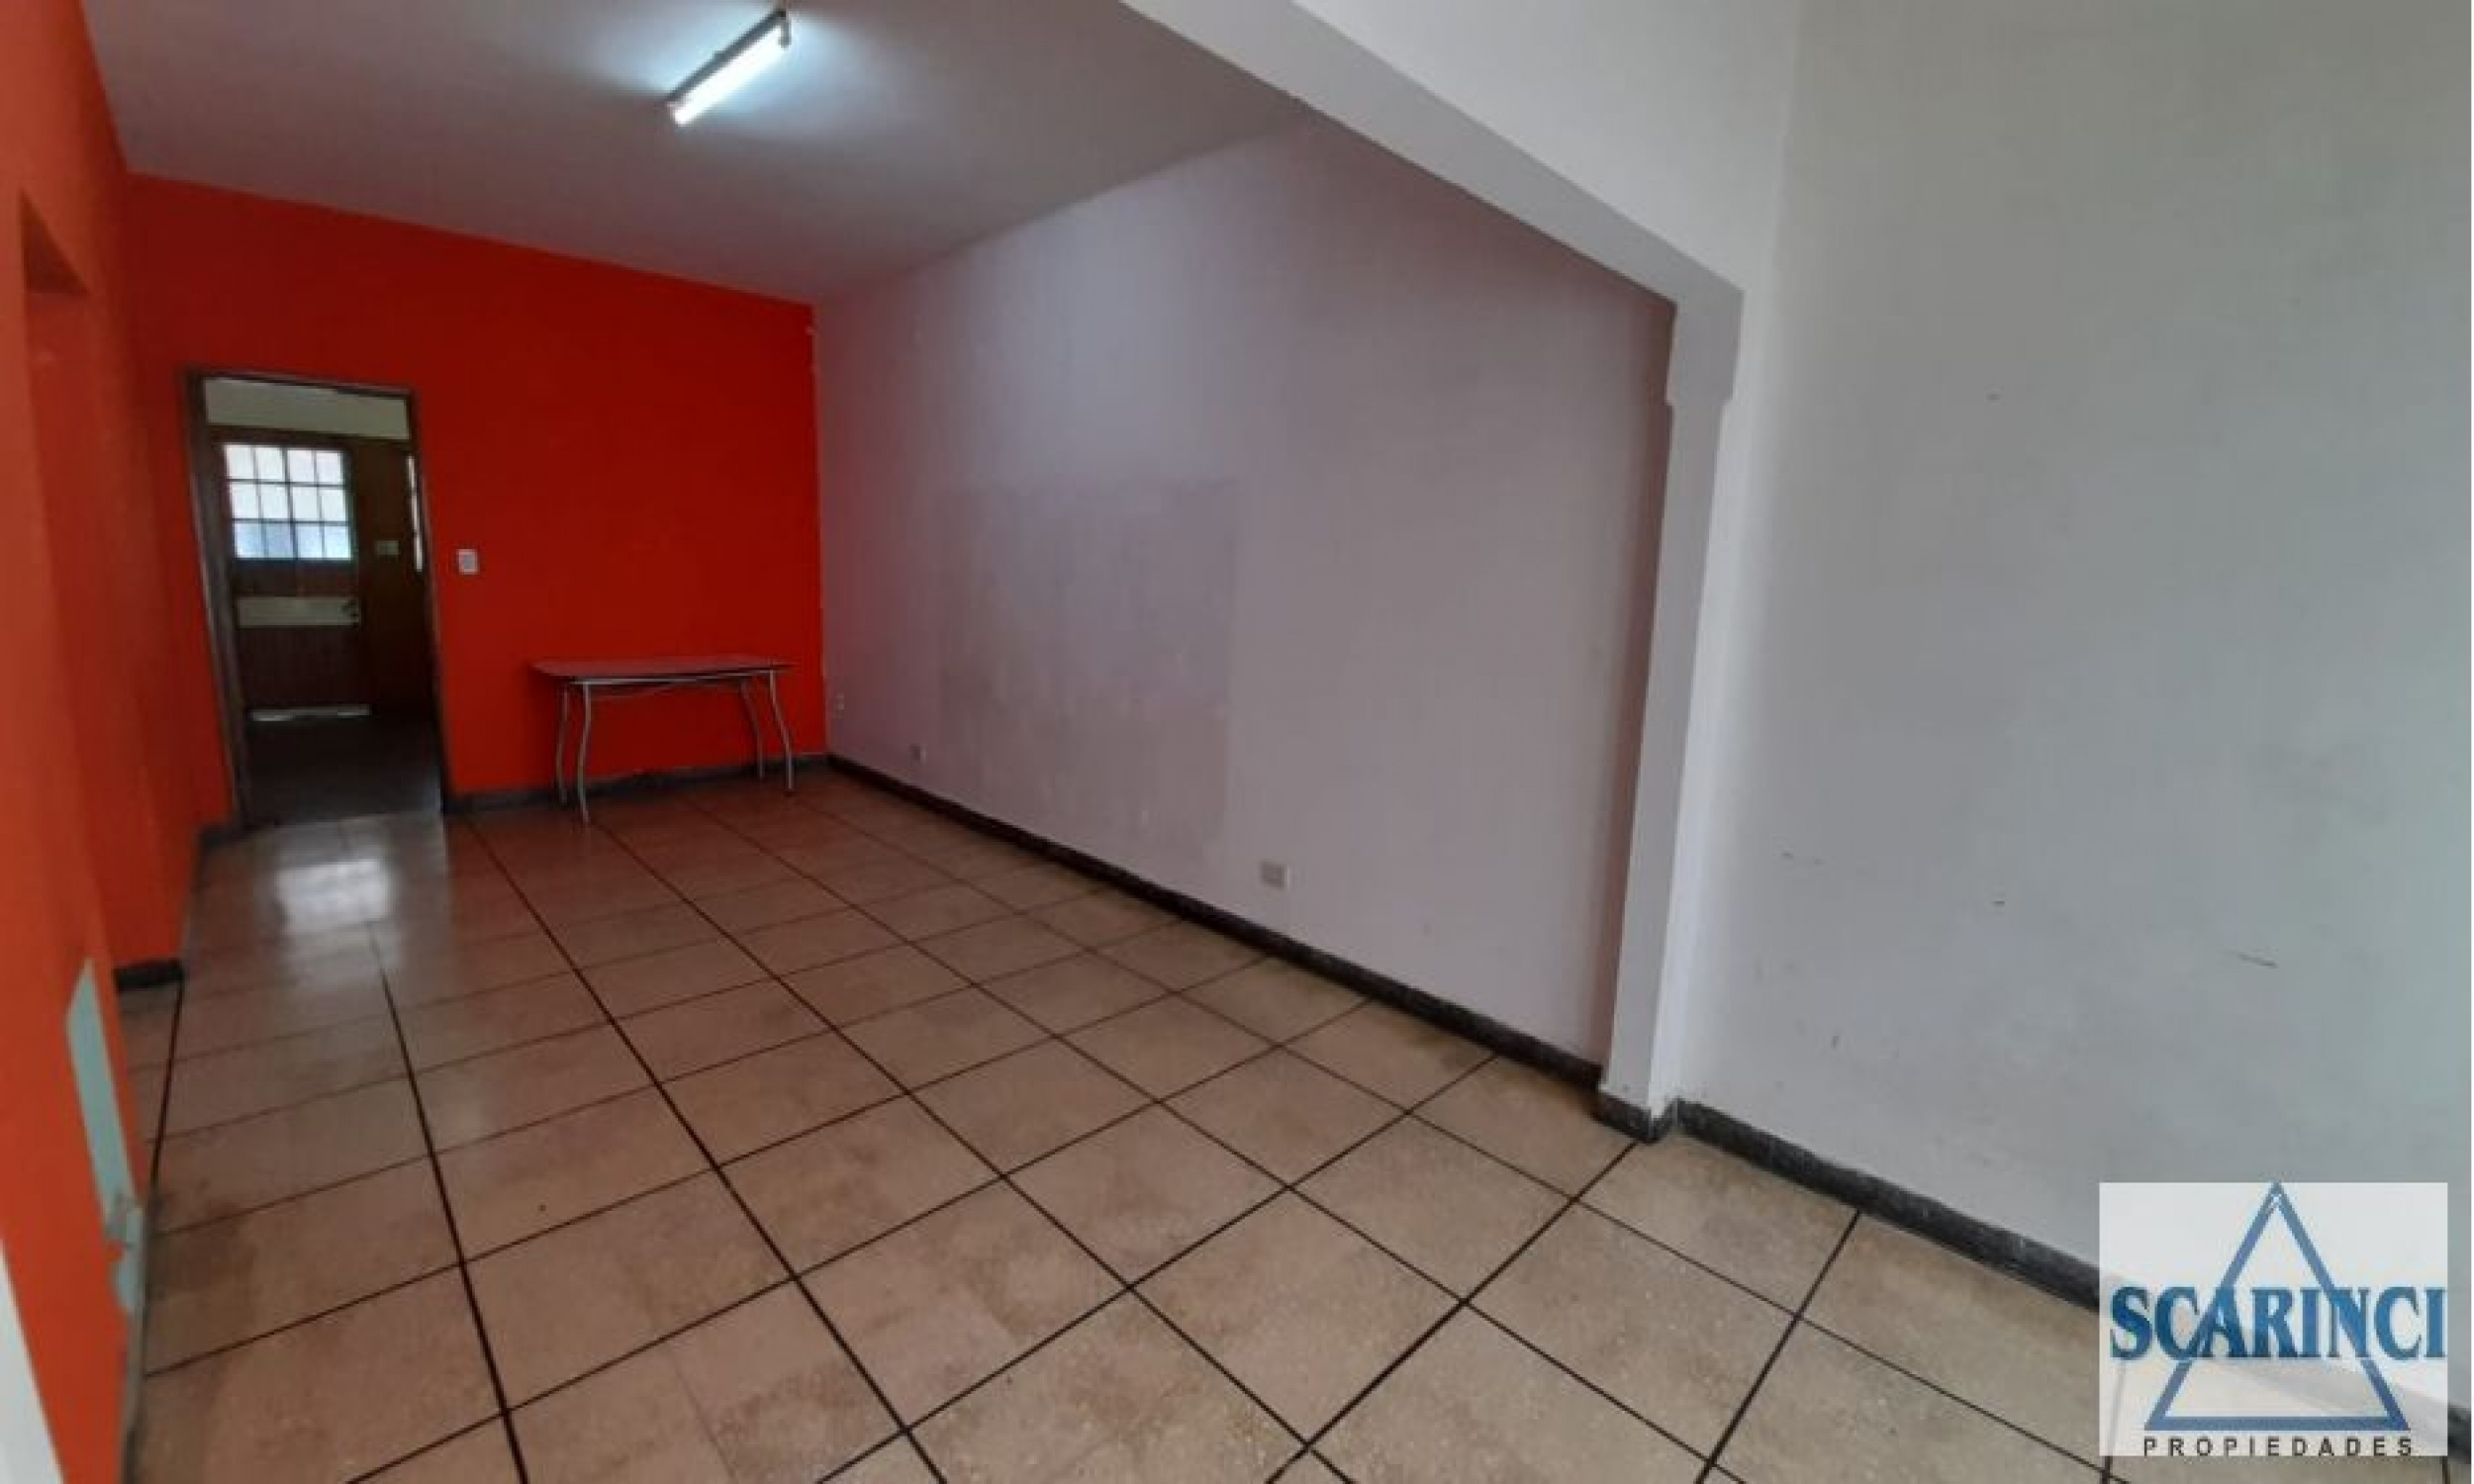 Calixto Oyuela 1700, Santos Lugares, Buenos Aires, Argentina, 3 Habitaciones Habitaciones, 2 Habitaciones Habitaciones,2 BathroomsBathrooms,Casa,Venta,Calixto Oyuela,1953